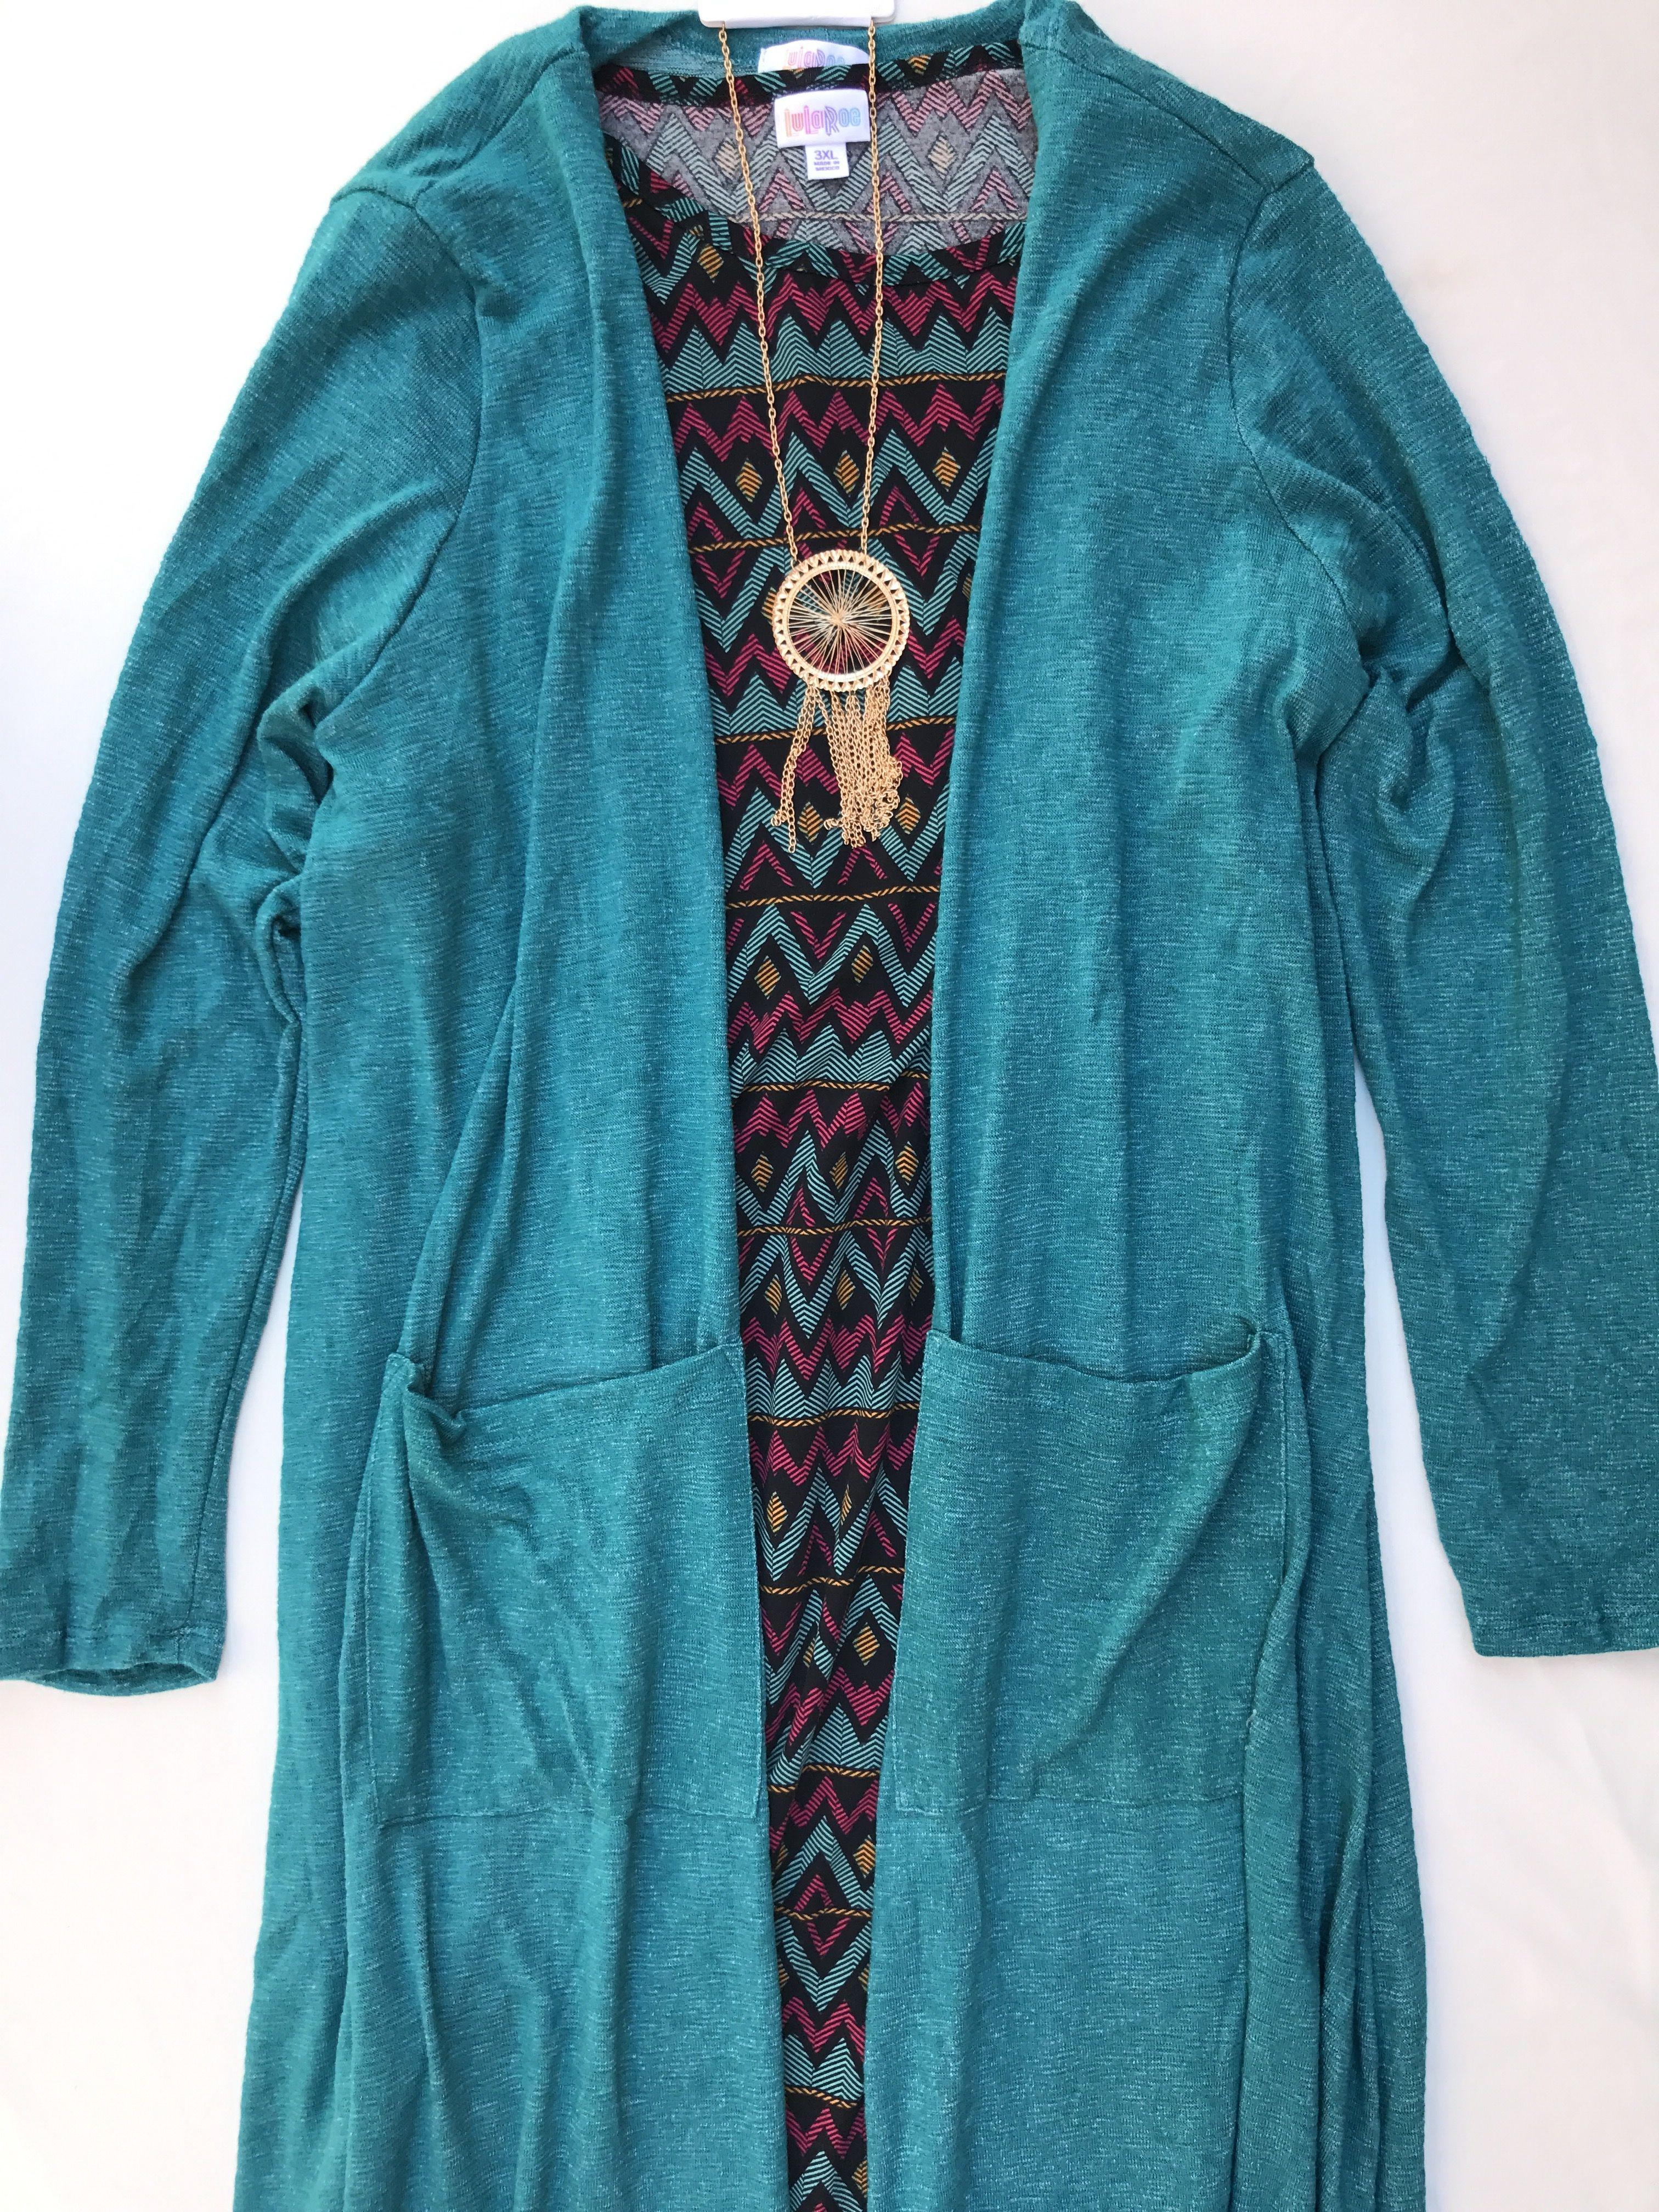 Plus size LuLaRoe fashion outfits - Aztec Juia dress and Sarah ...